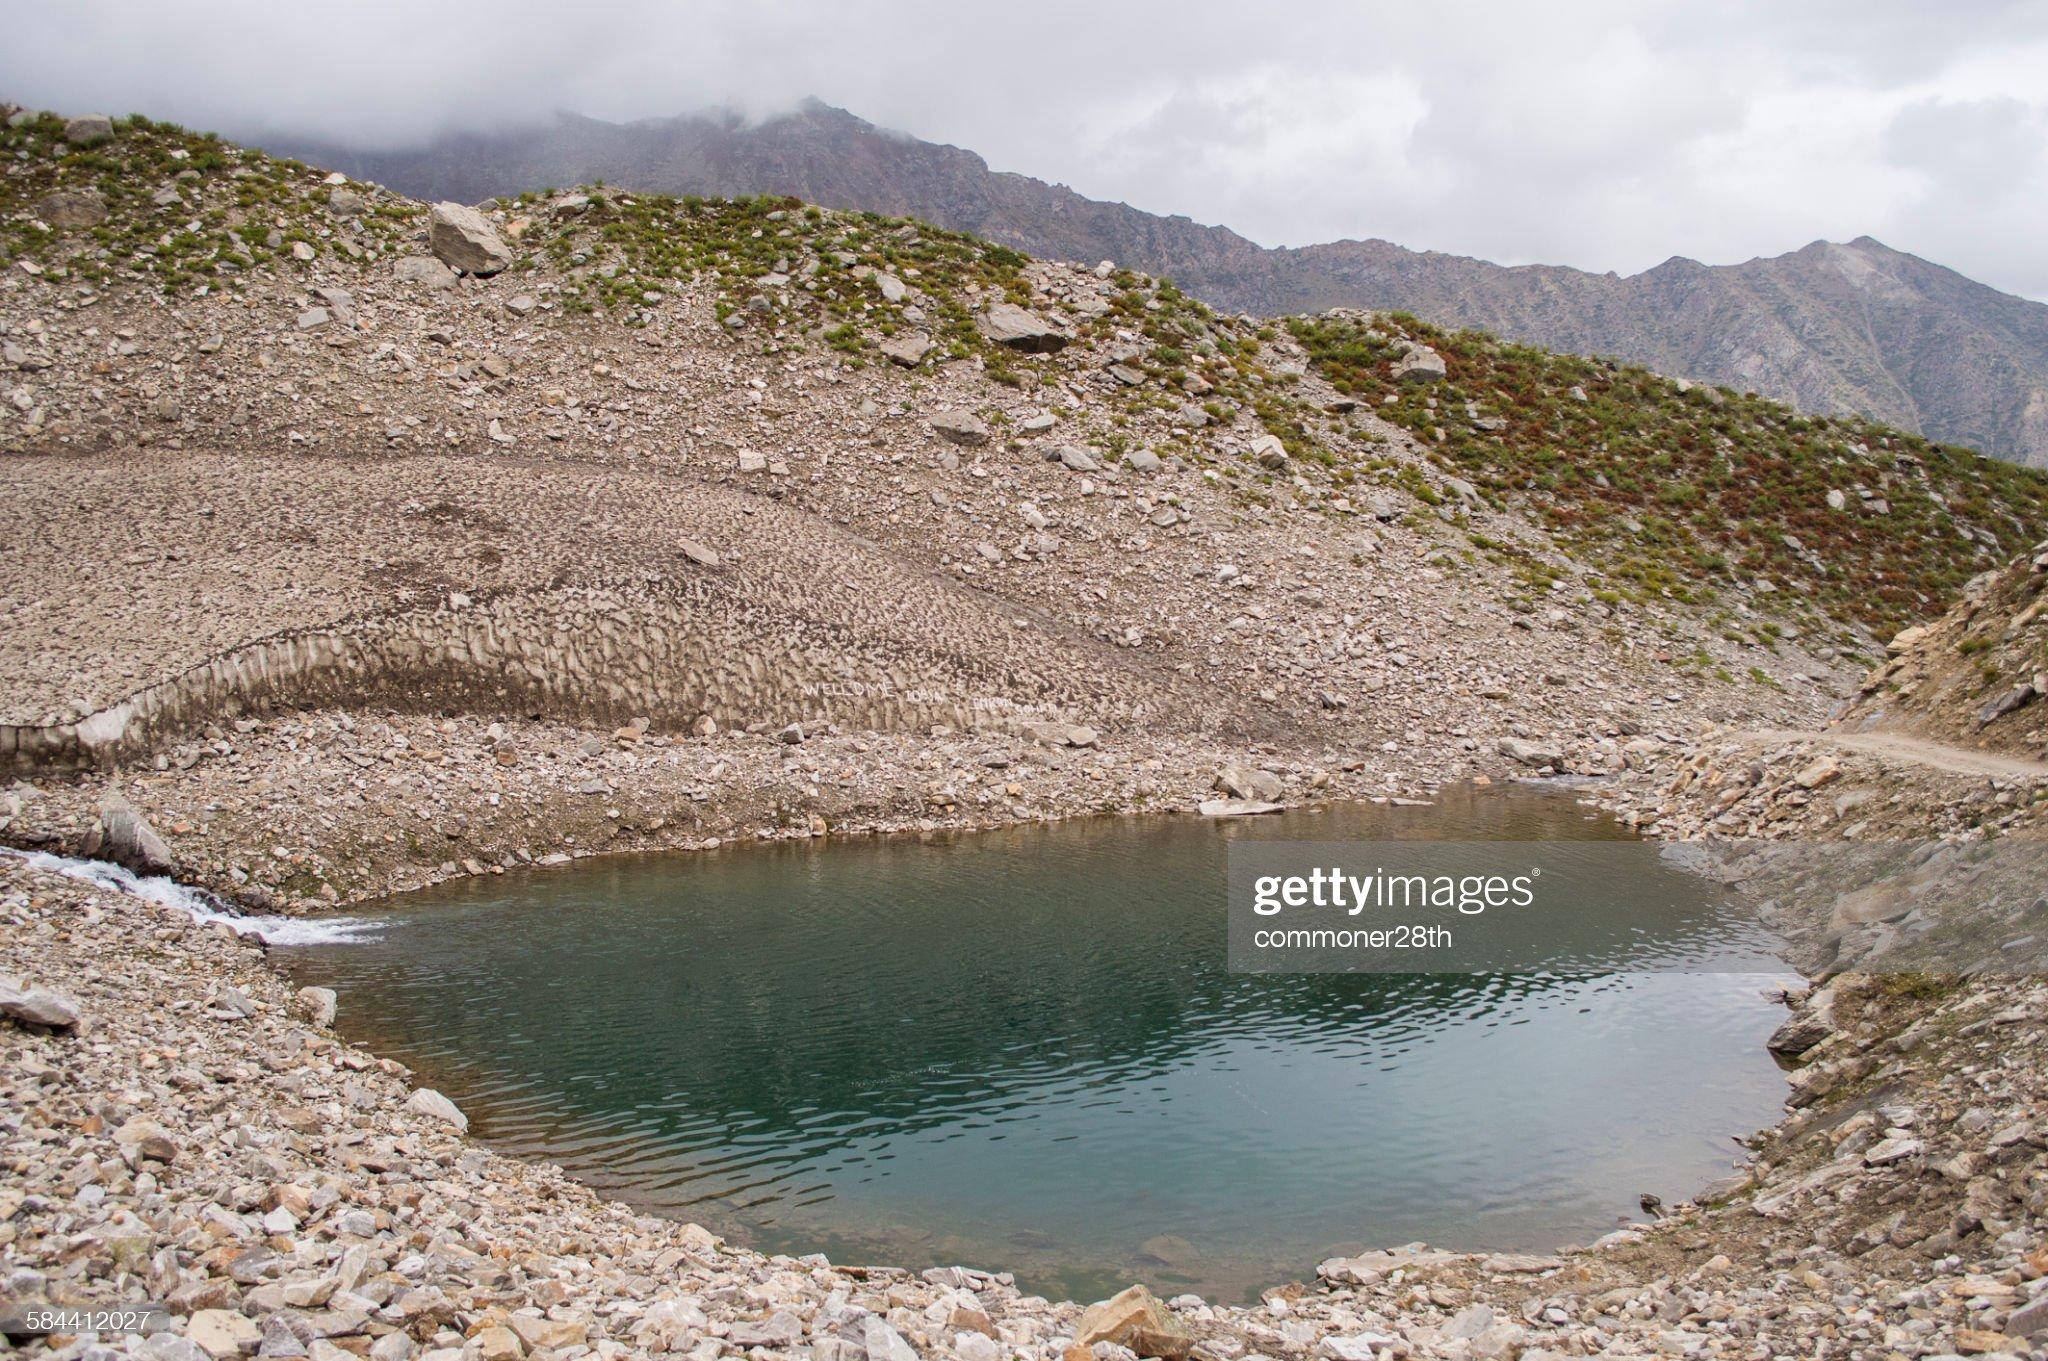 Rama Lake Astore, Gigit-Baltistan. 5 beautiful lakes in Gilgit-Baltistan.